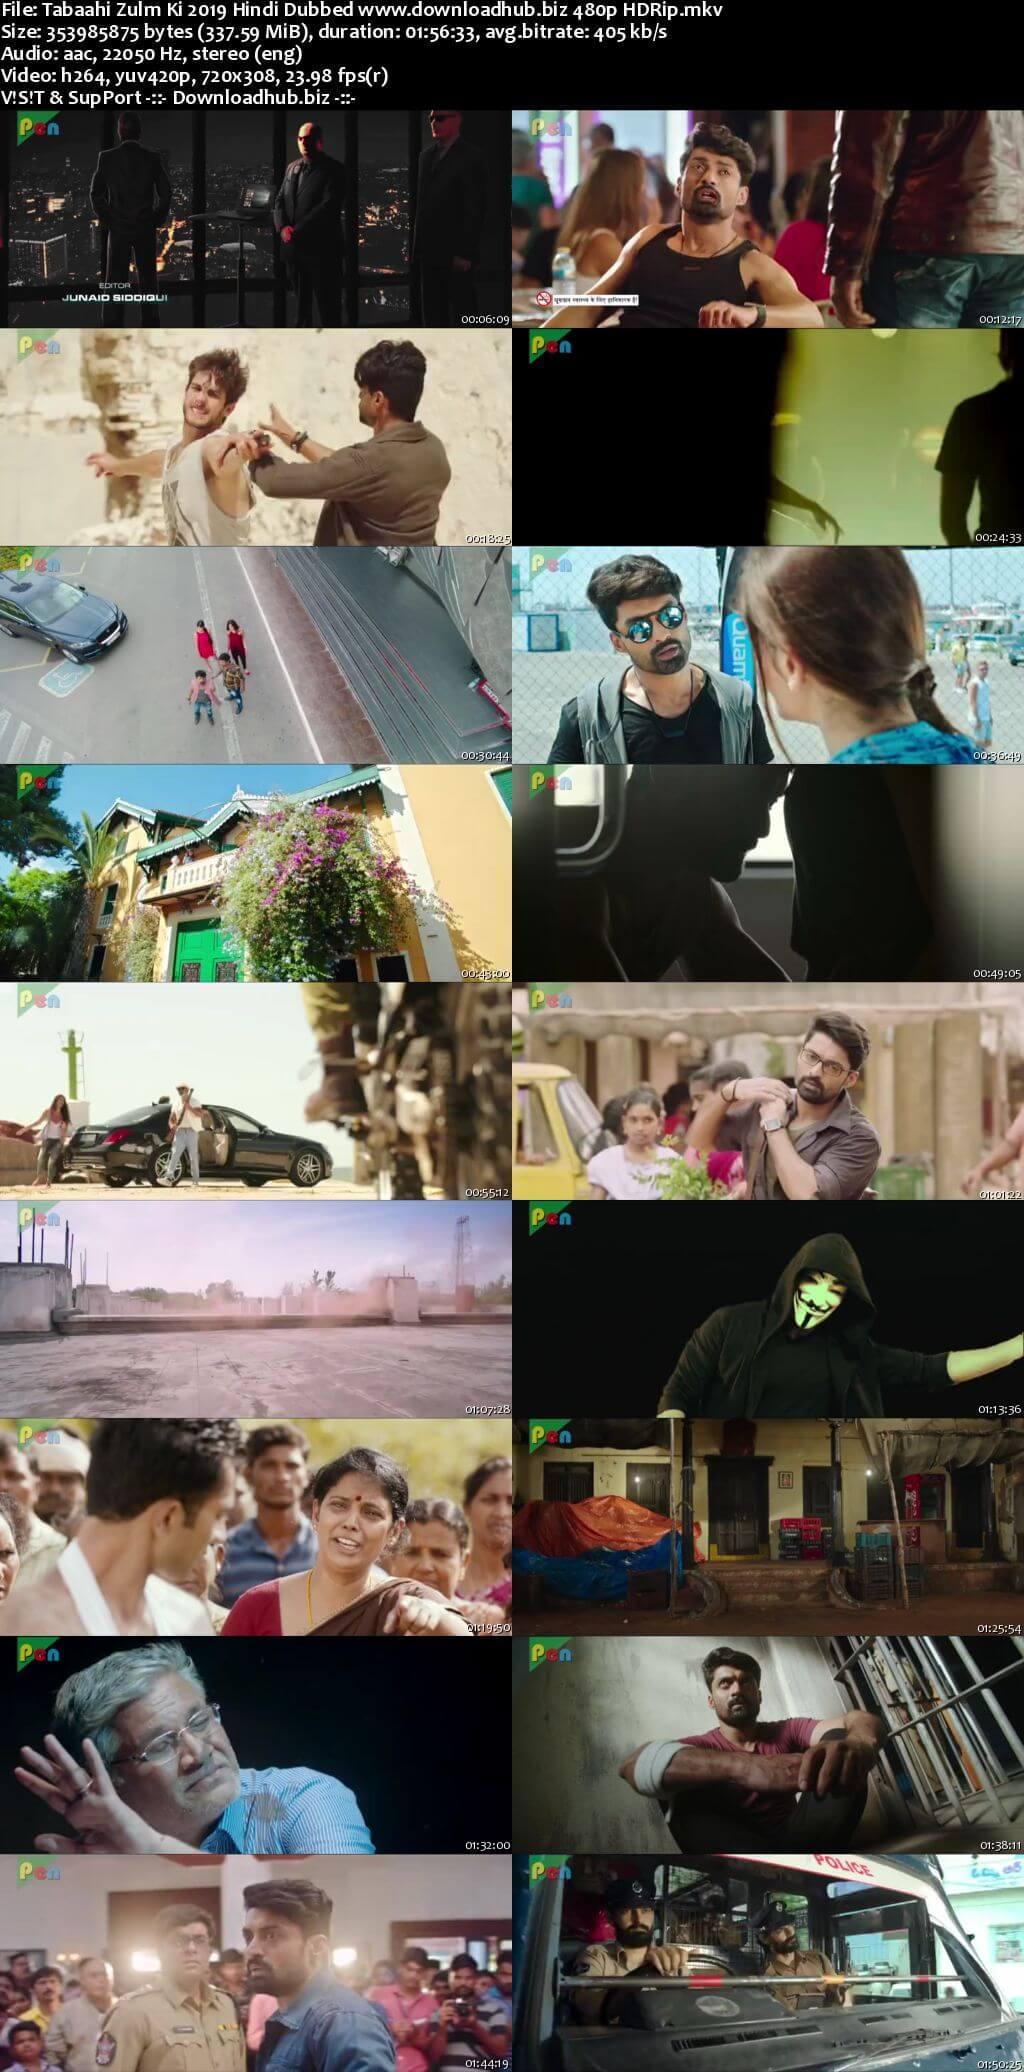 Tabaahi Zulm Ki 2019 Hindi Dubbed 300MB HDRip 480p